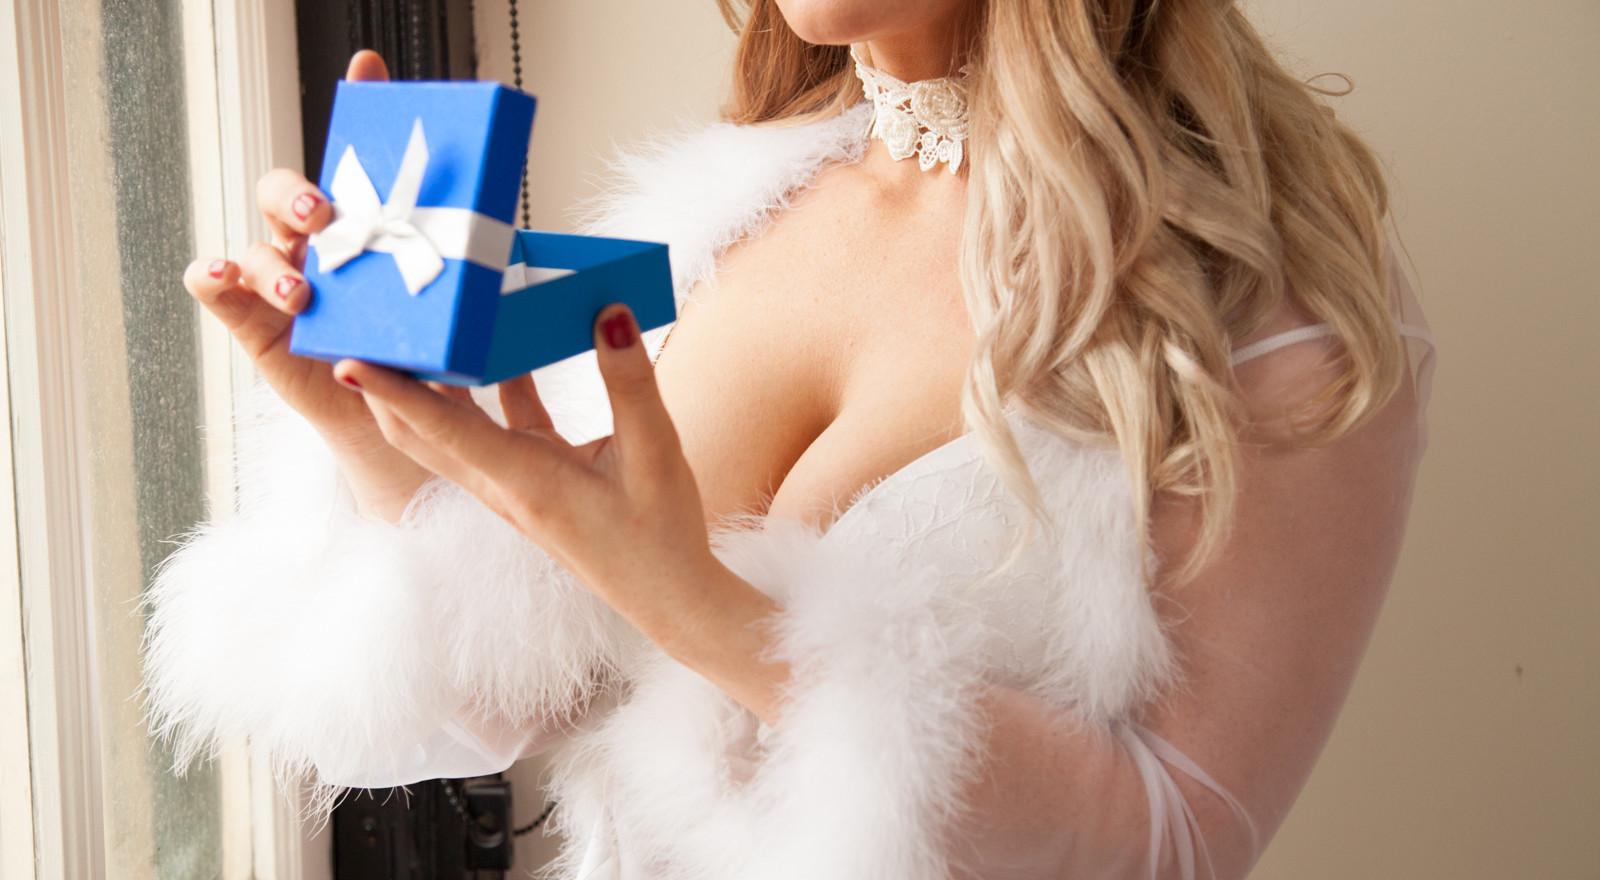 Blonde bombshell unwraps Christmas present